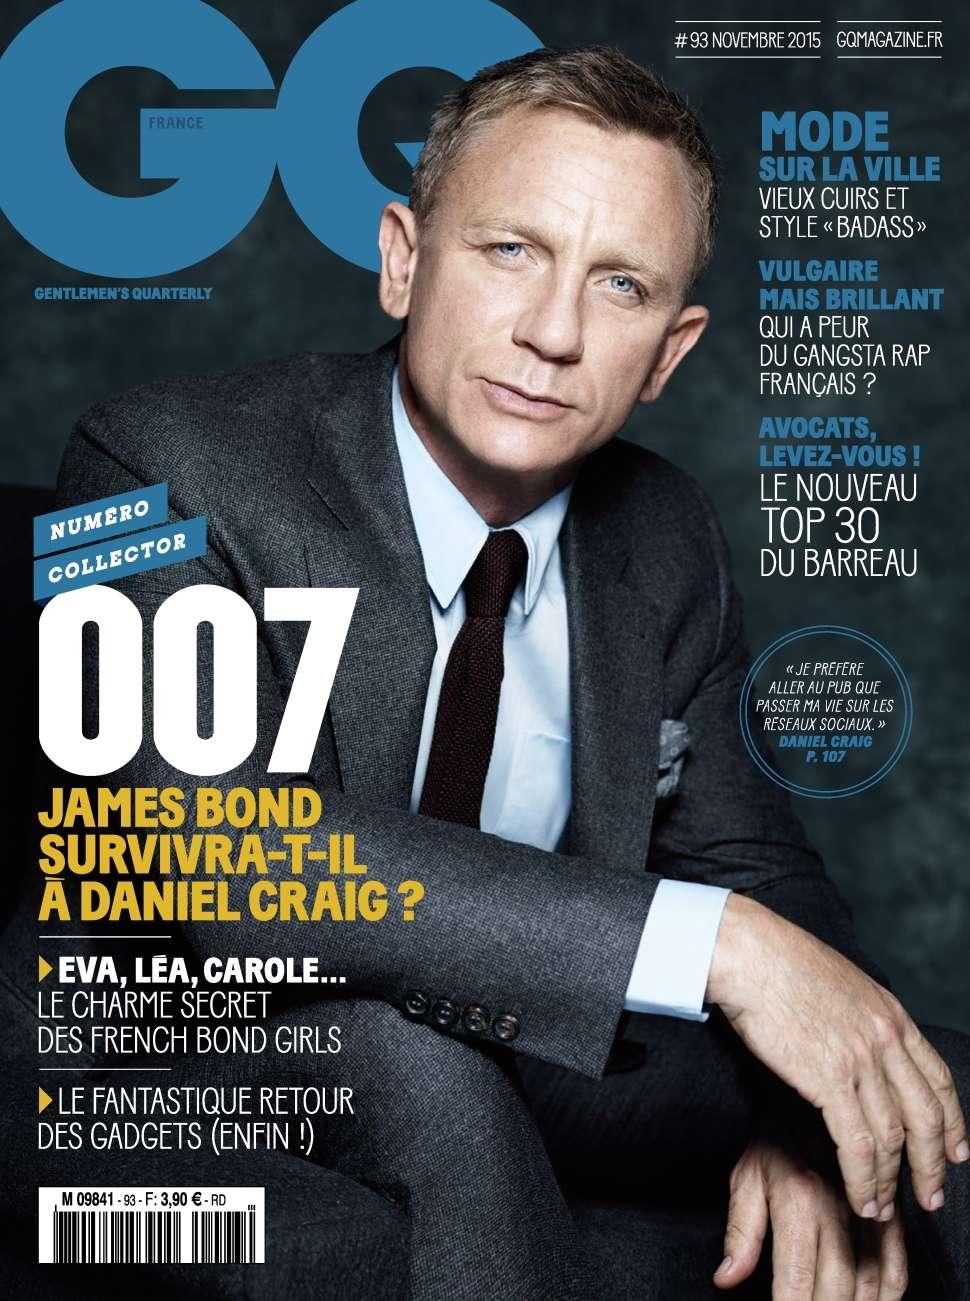 GQ 93 - Novembre 2015